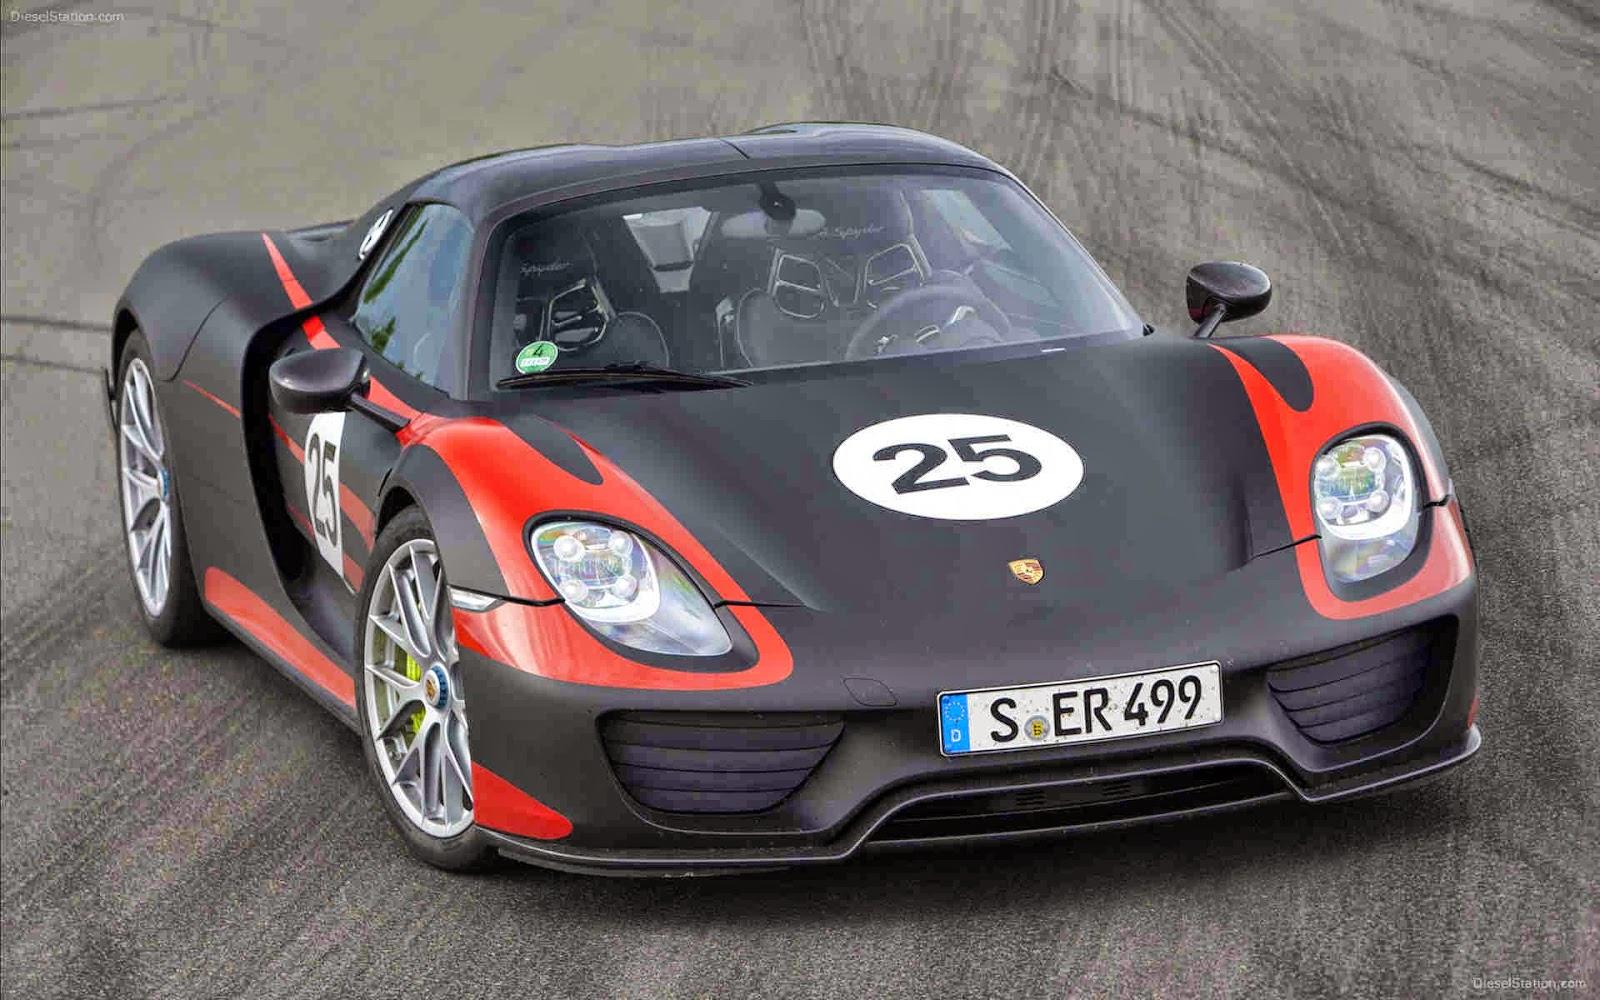 Porsche 918 Spyder Exquisite Design And Power Of 875bhp